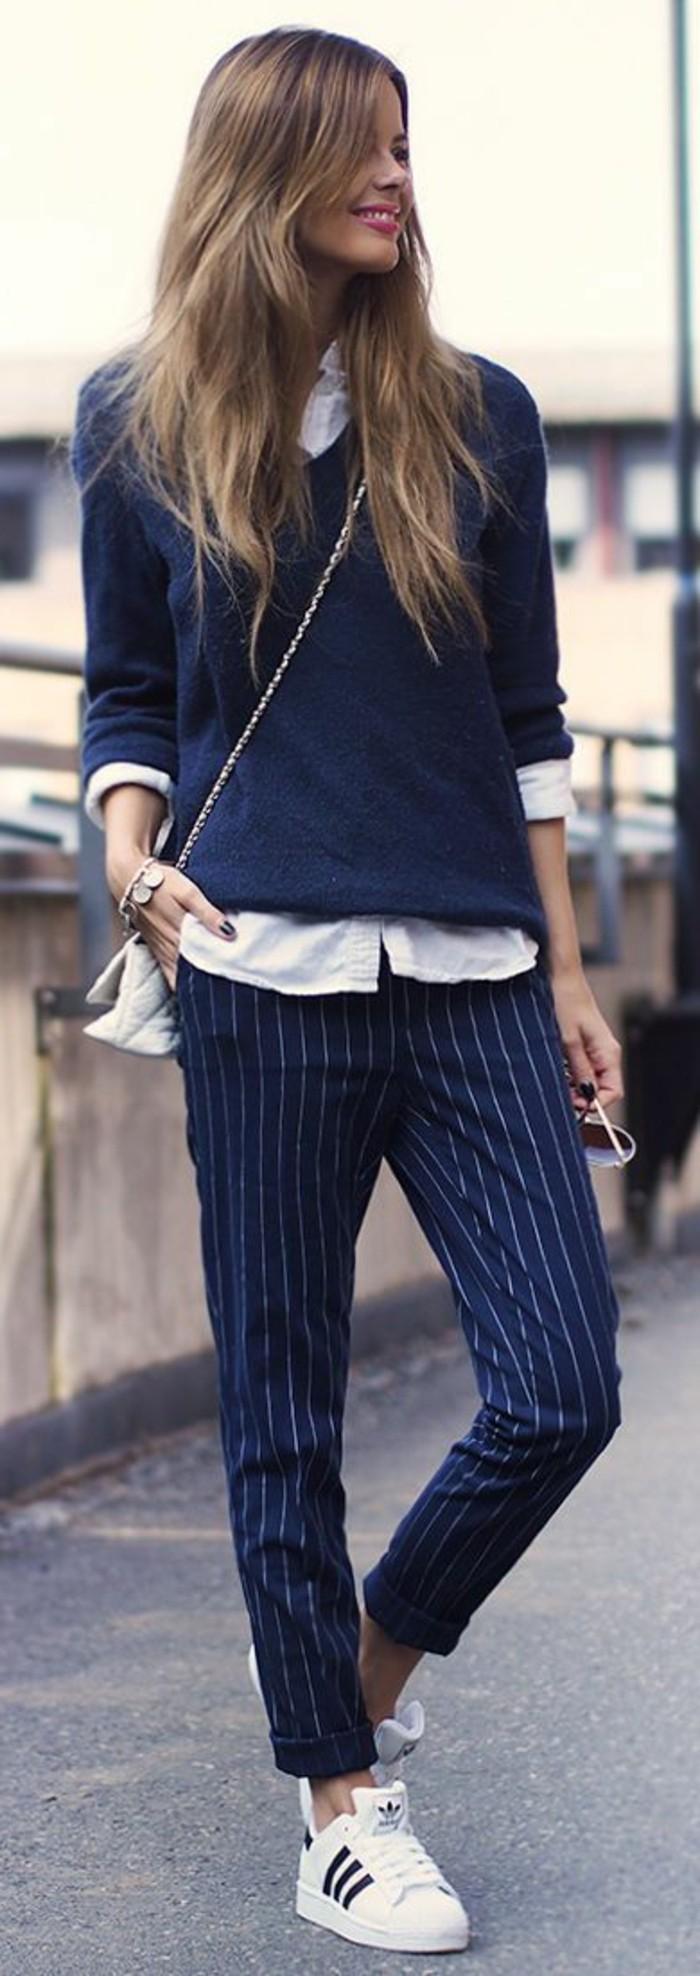 idée-pull-femme-jacquard-tenue-hiver-belle-femme